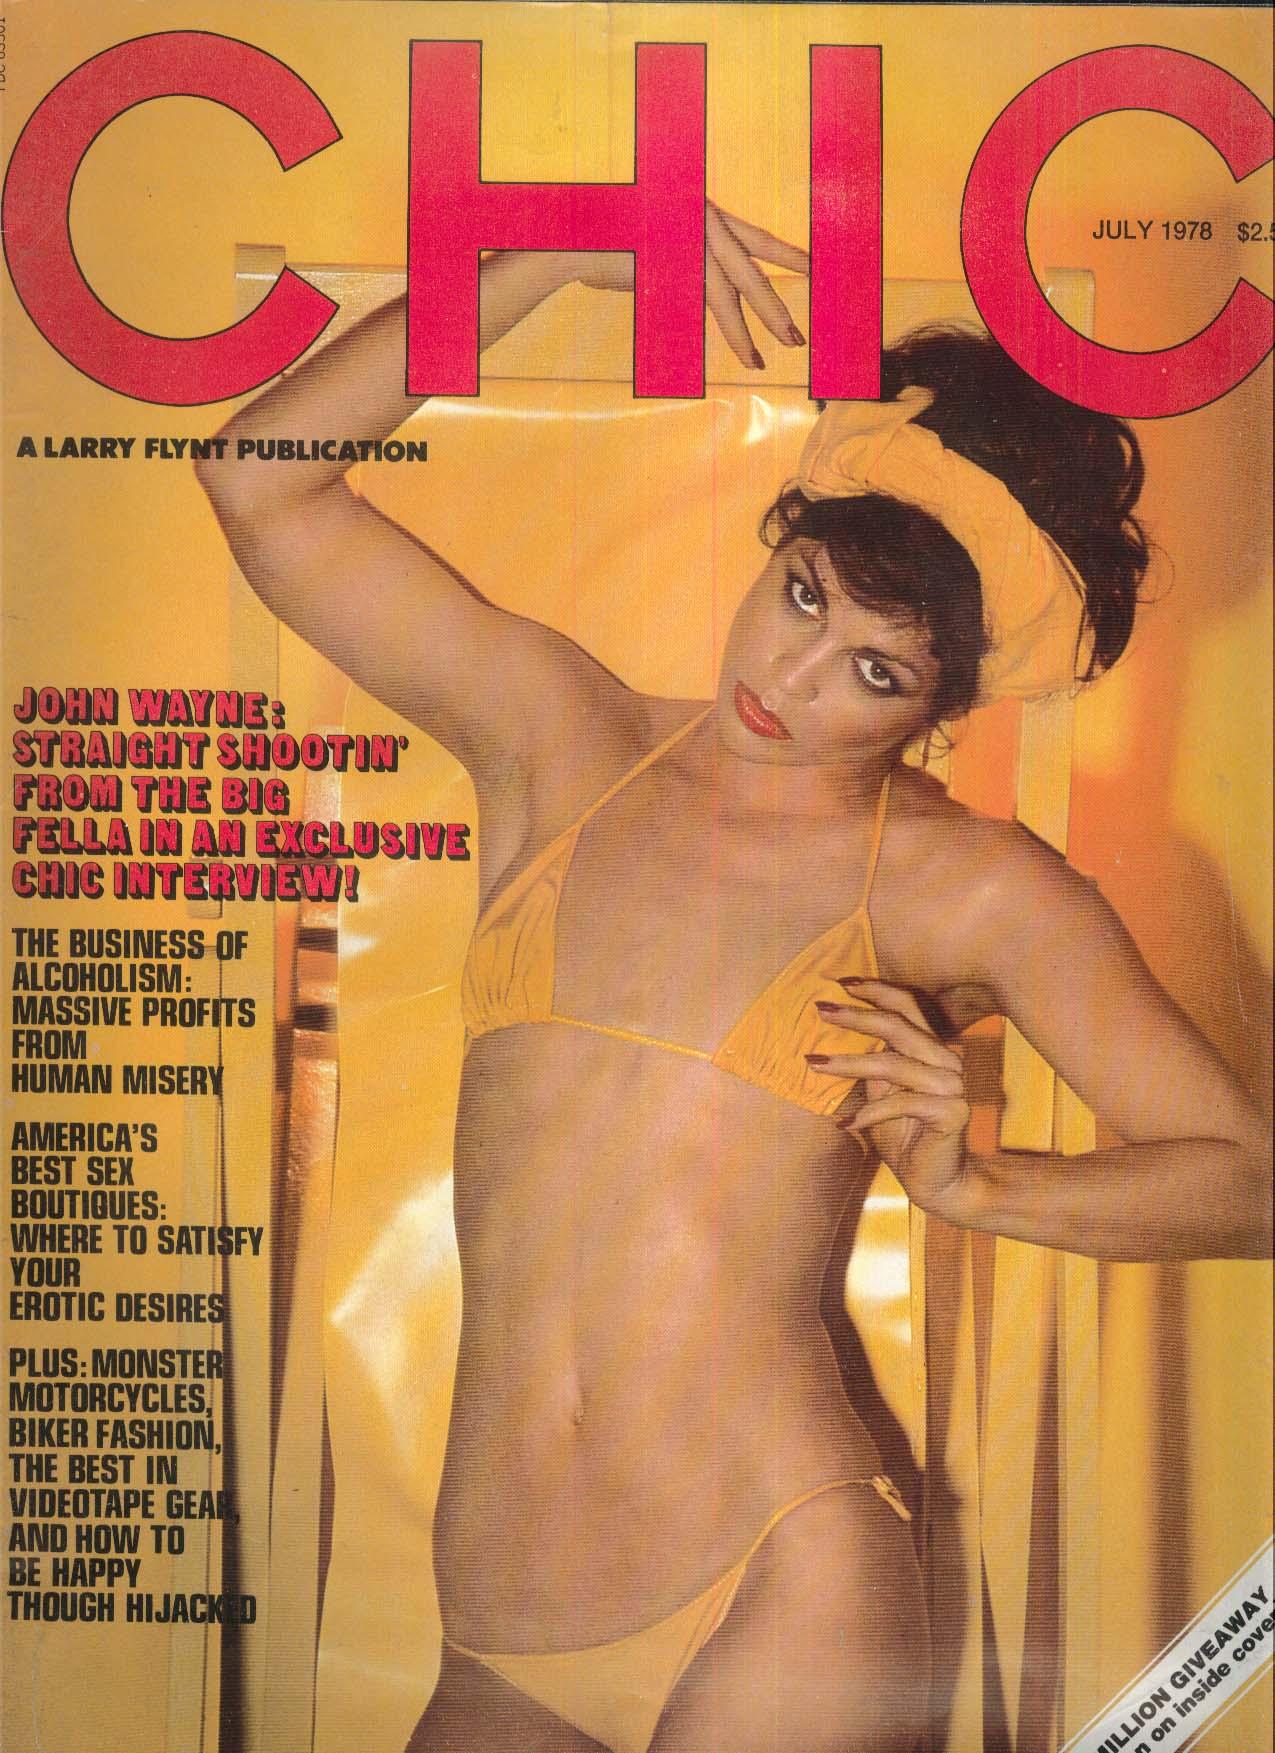 CHIC John Wayne Suze Randall Elliot Mintz 7 1978